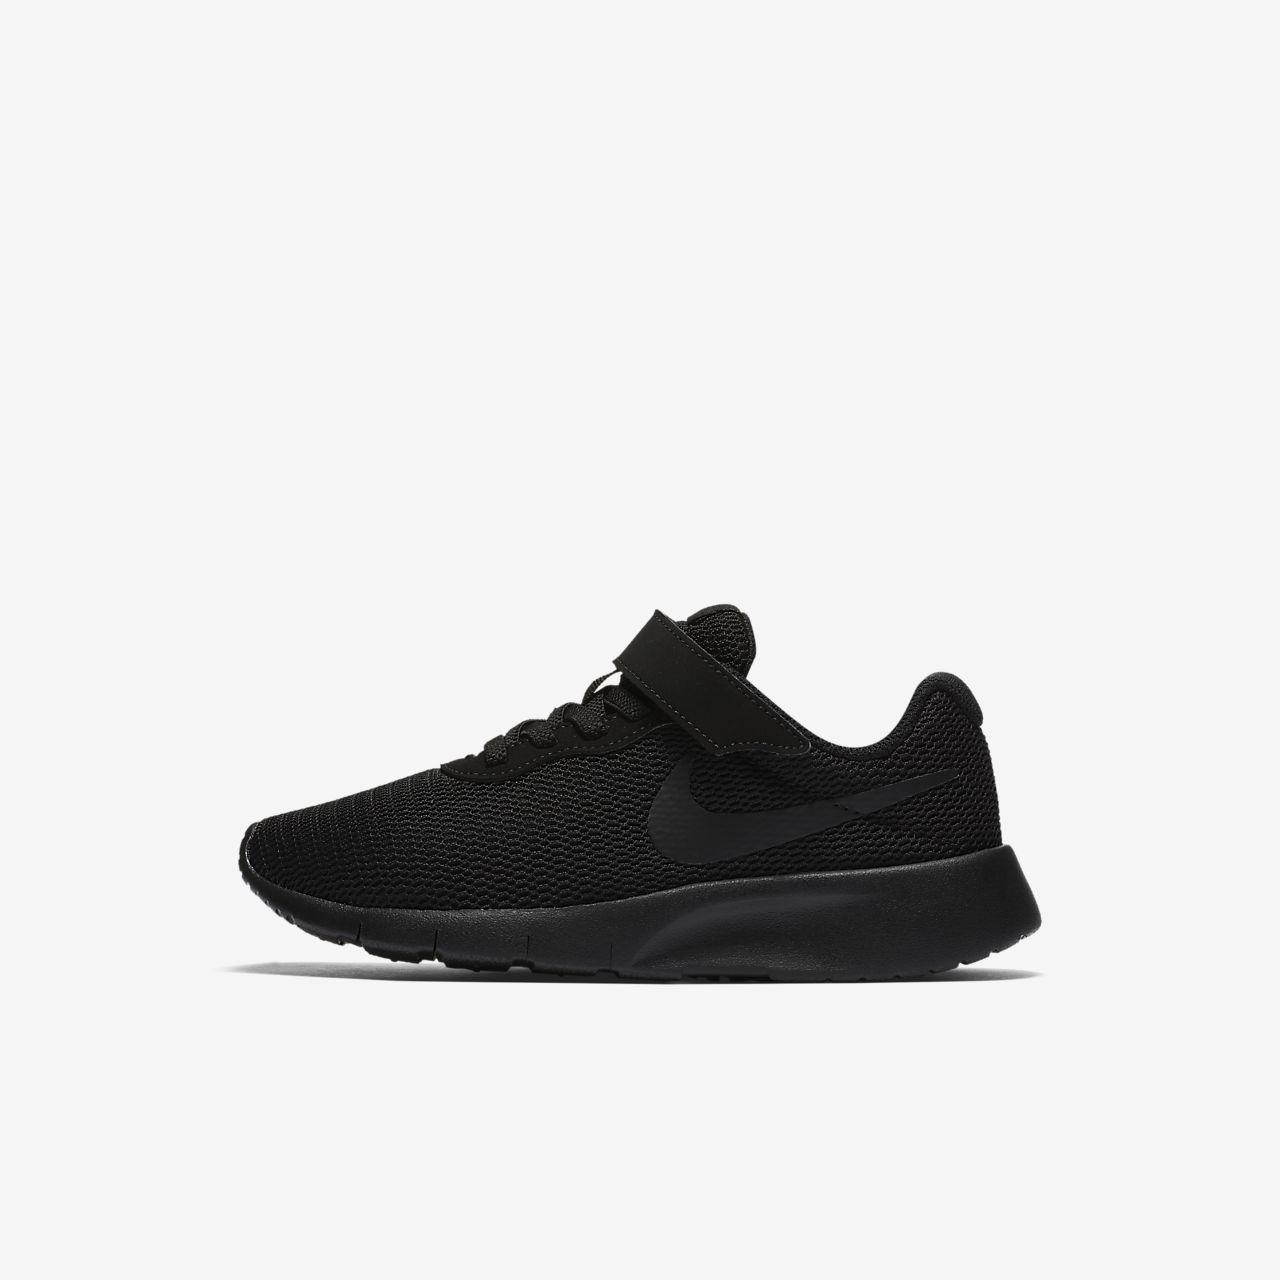 ... Chaussure Nike Tanjun pour Jeune enfant (27,5-35)